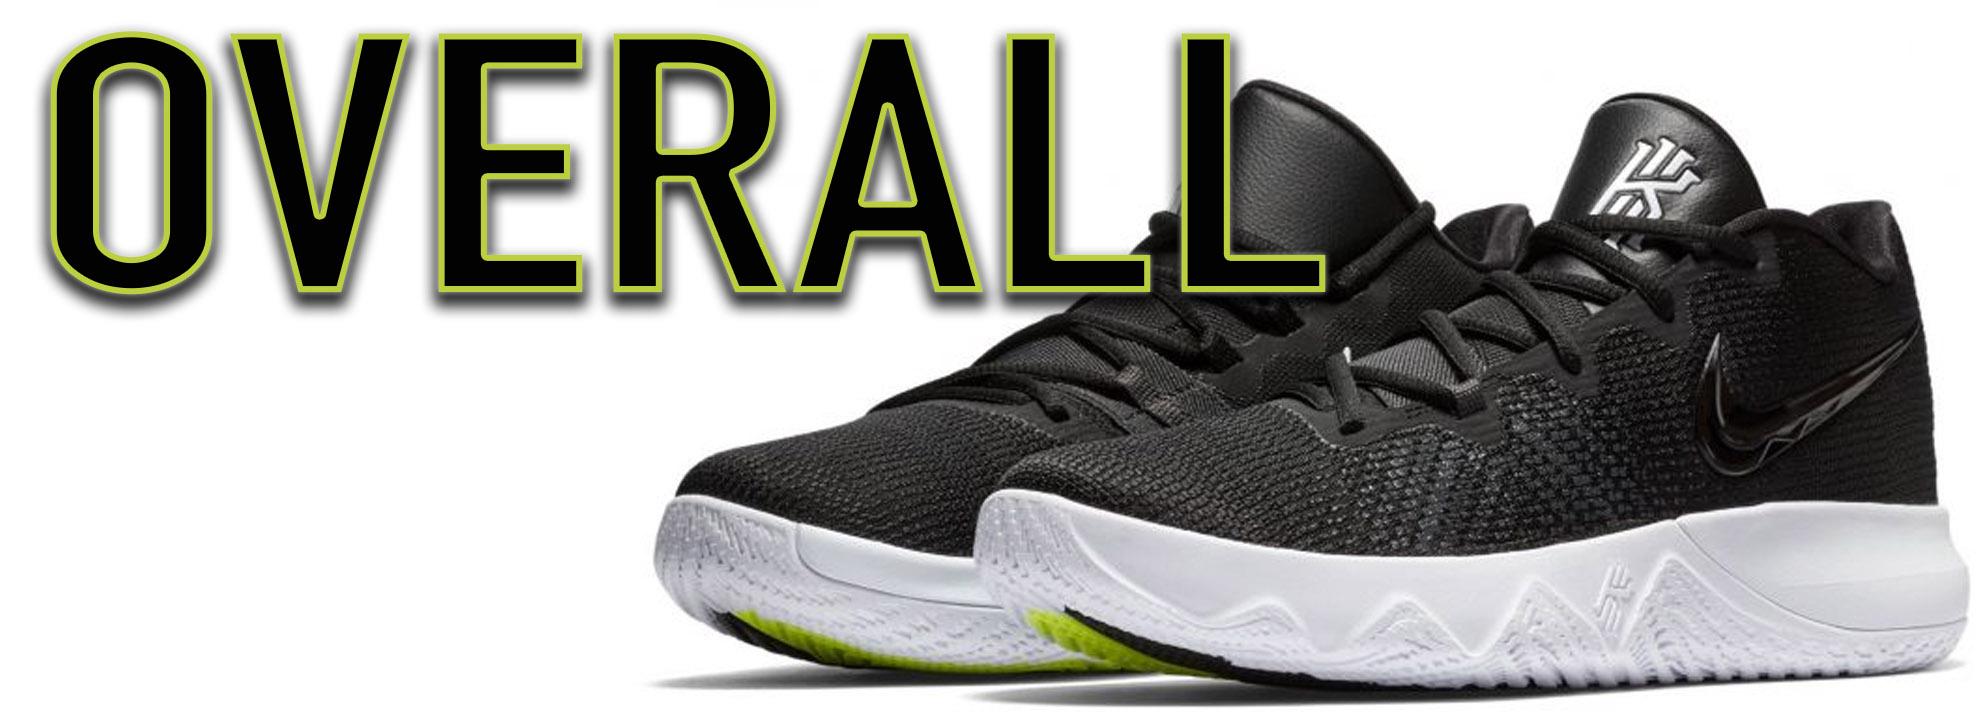 Nike Nascar Shoes